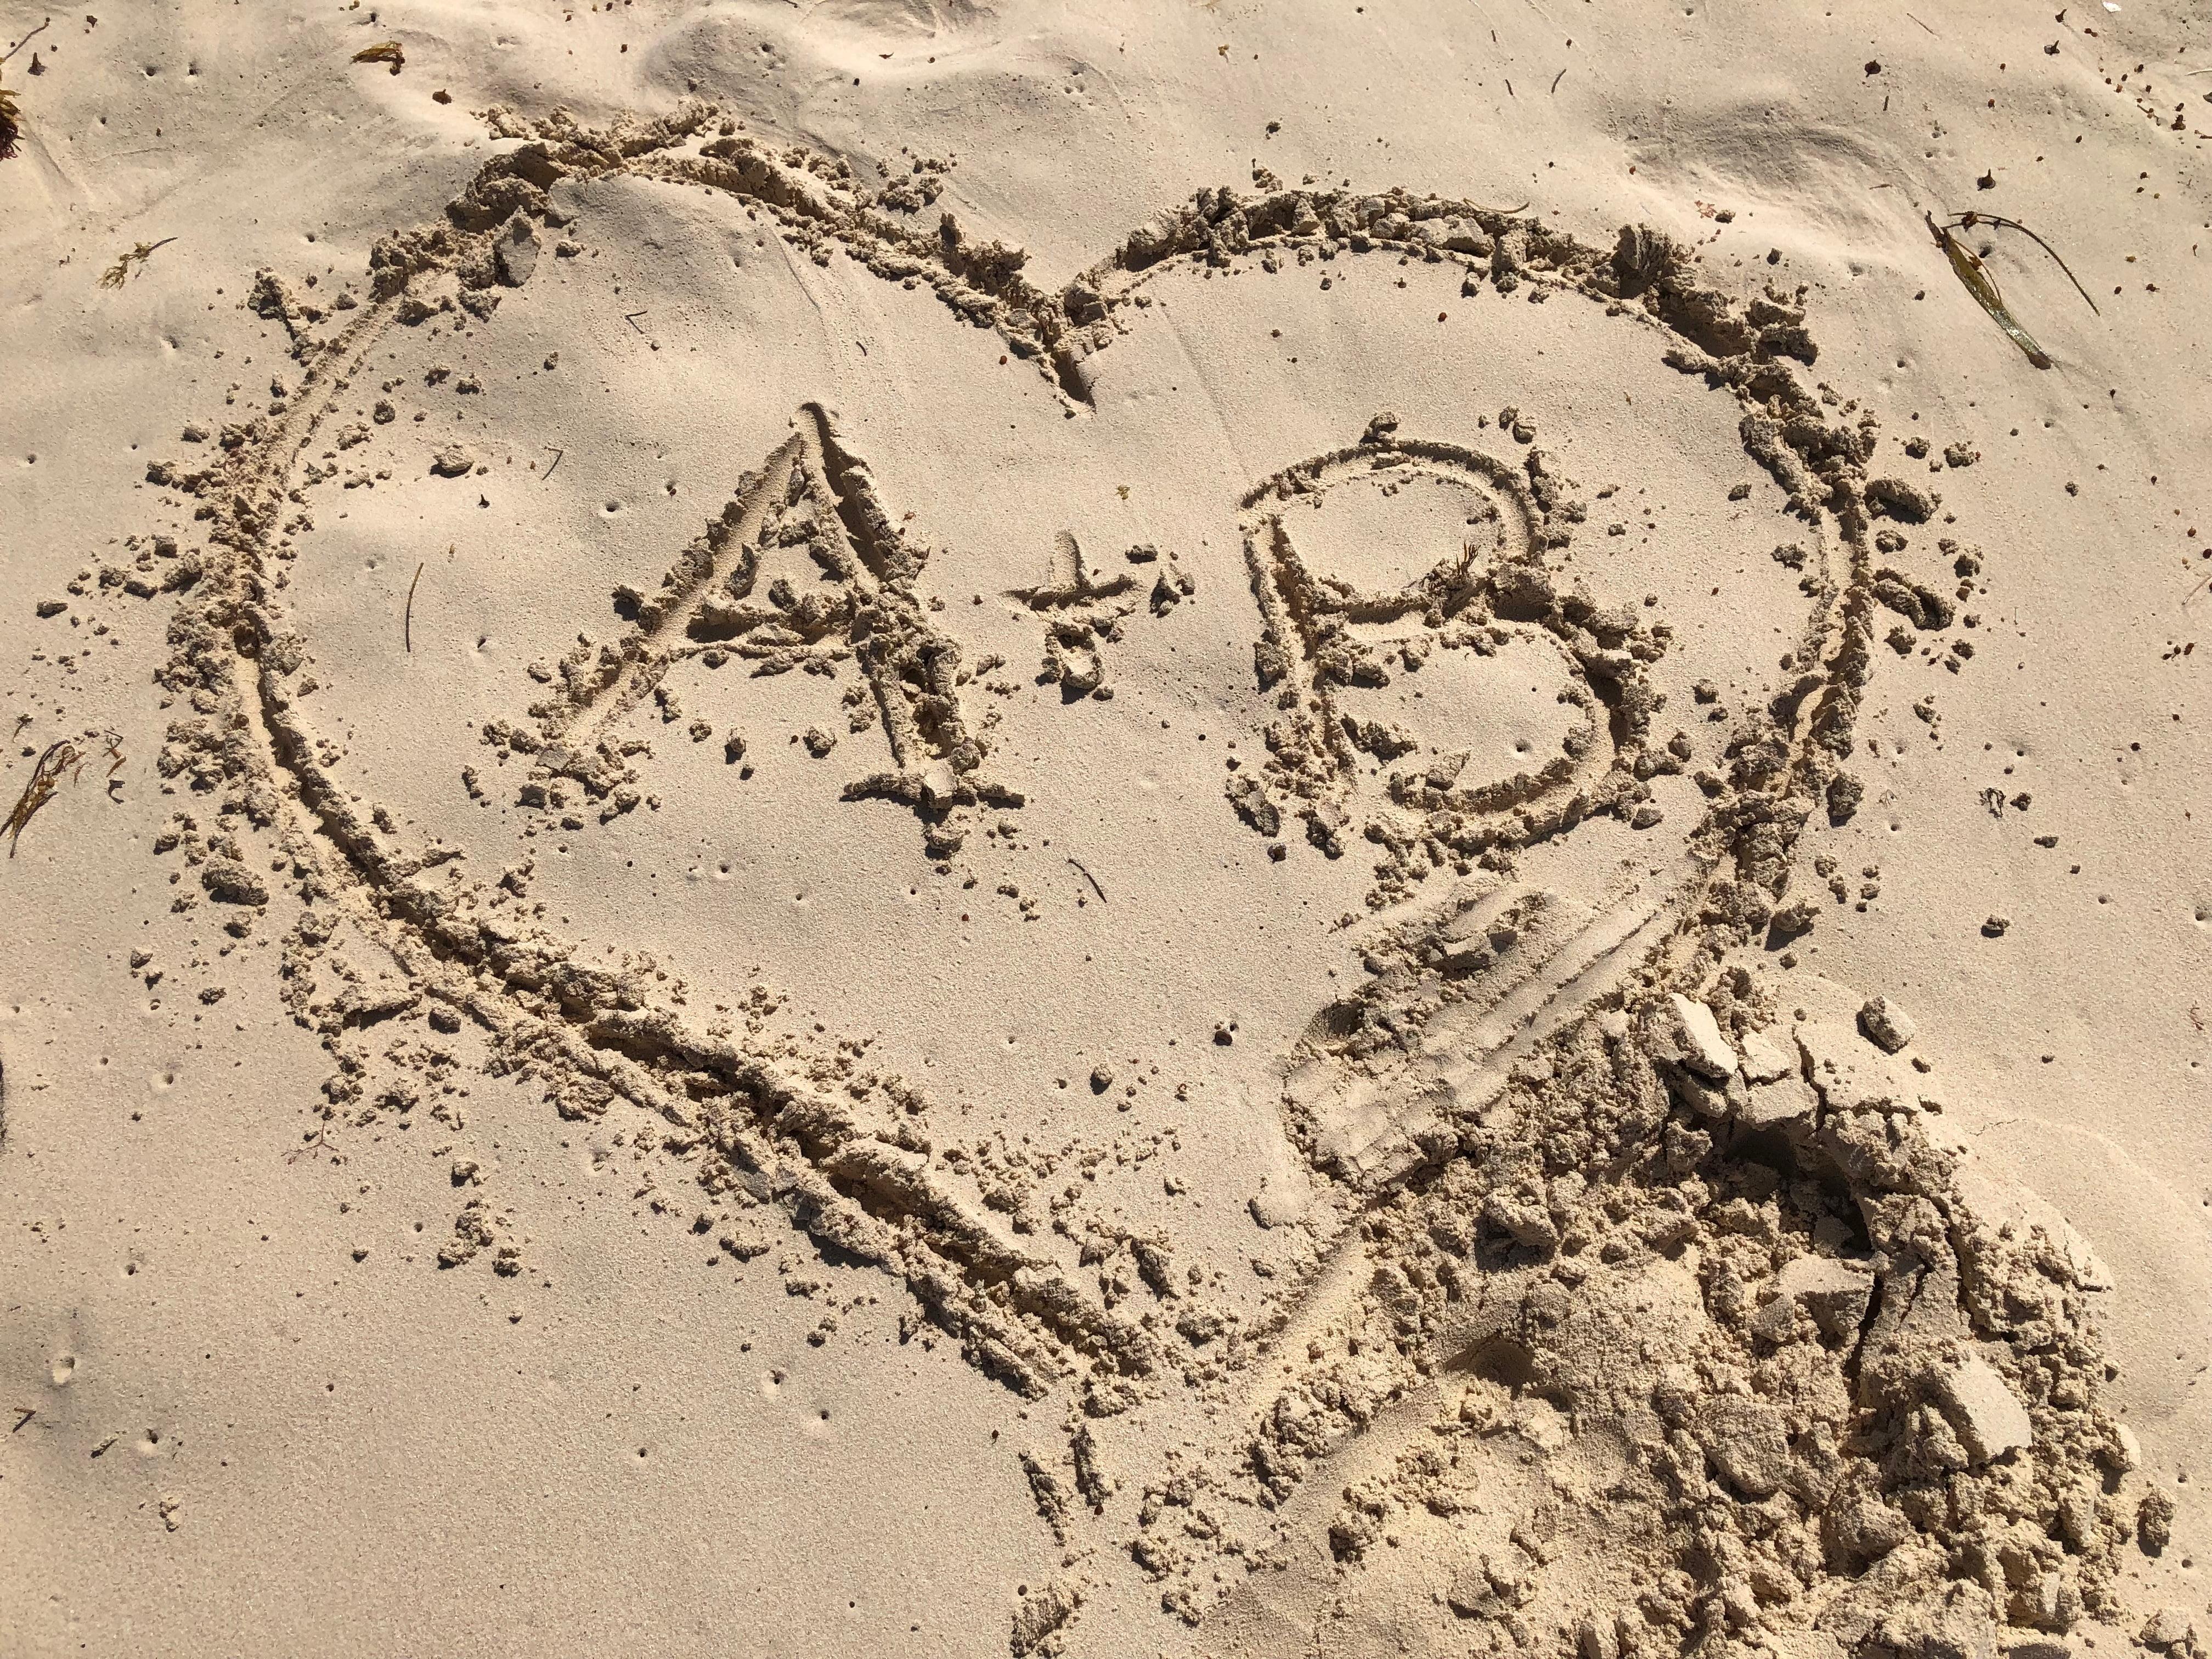 Initials in Heart written in Sand in Dominican Republic